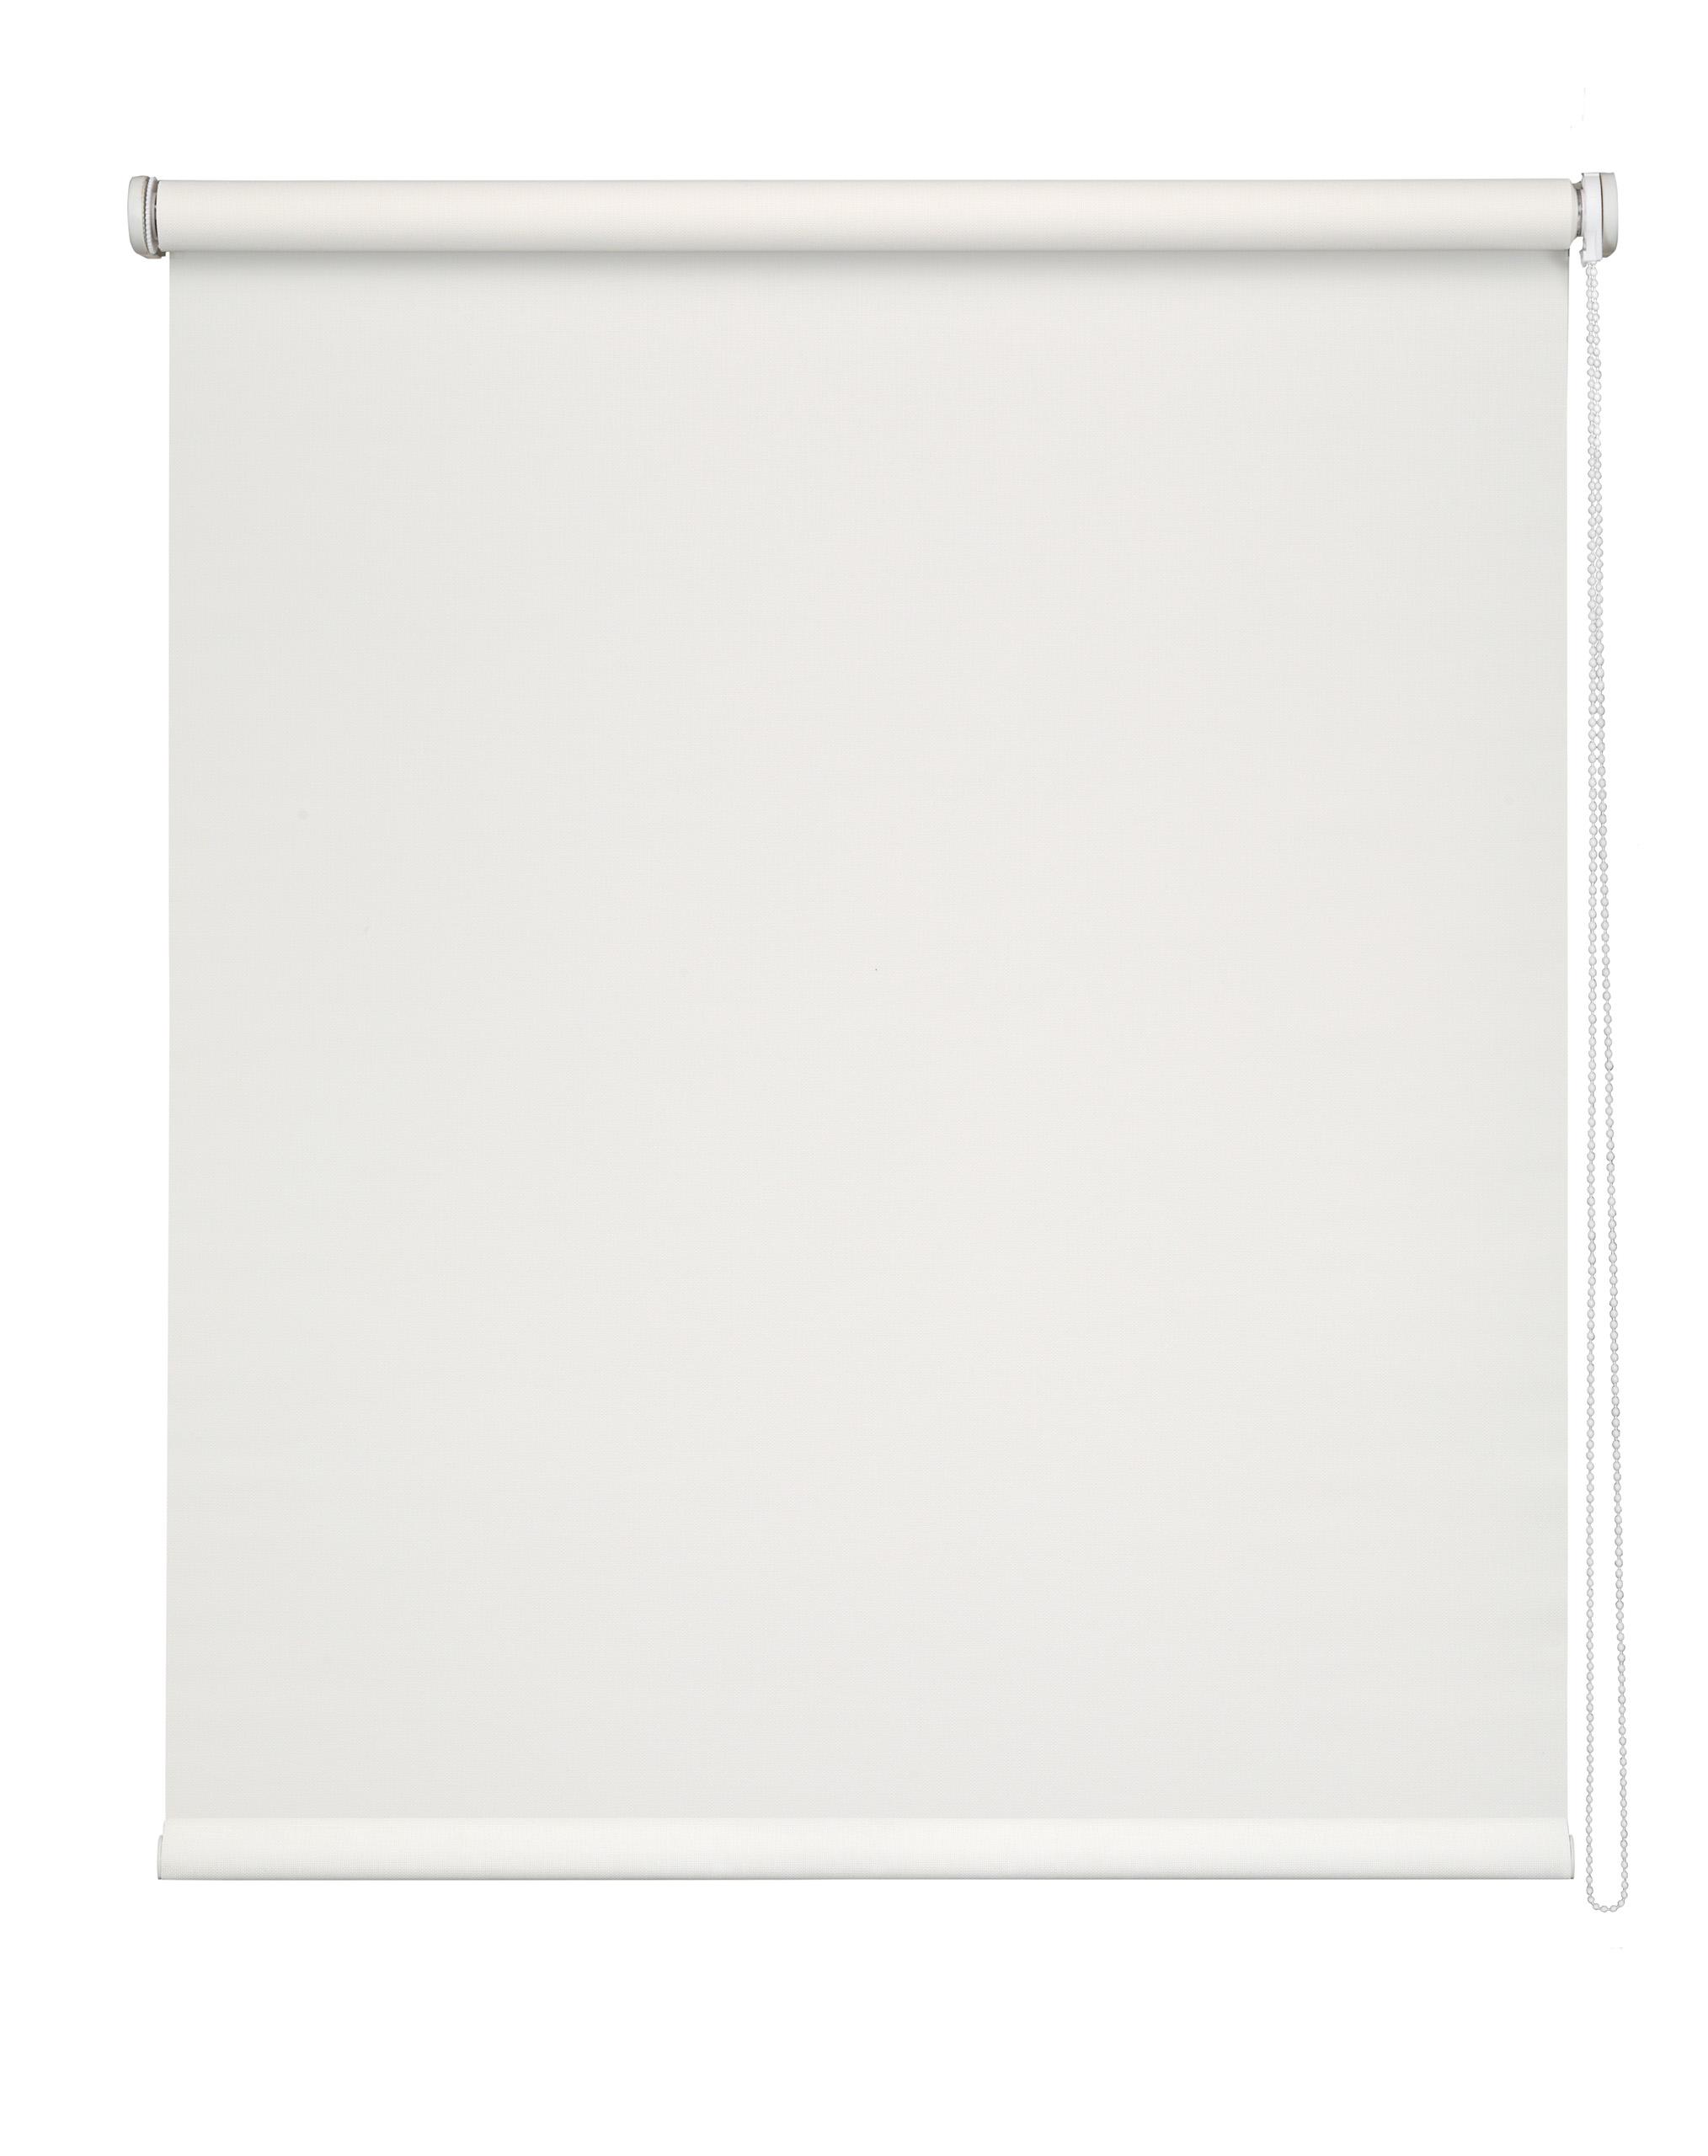 Store Enrouleur voile Screen - Blanc - 135 x 250 cm